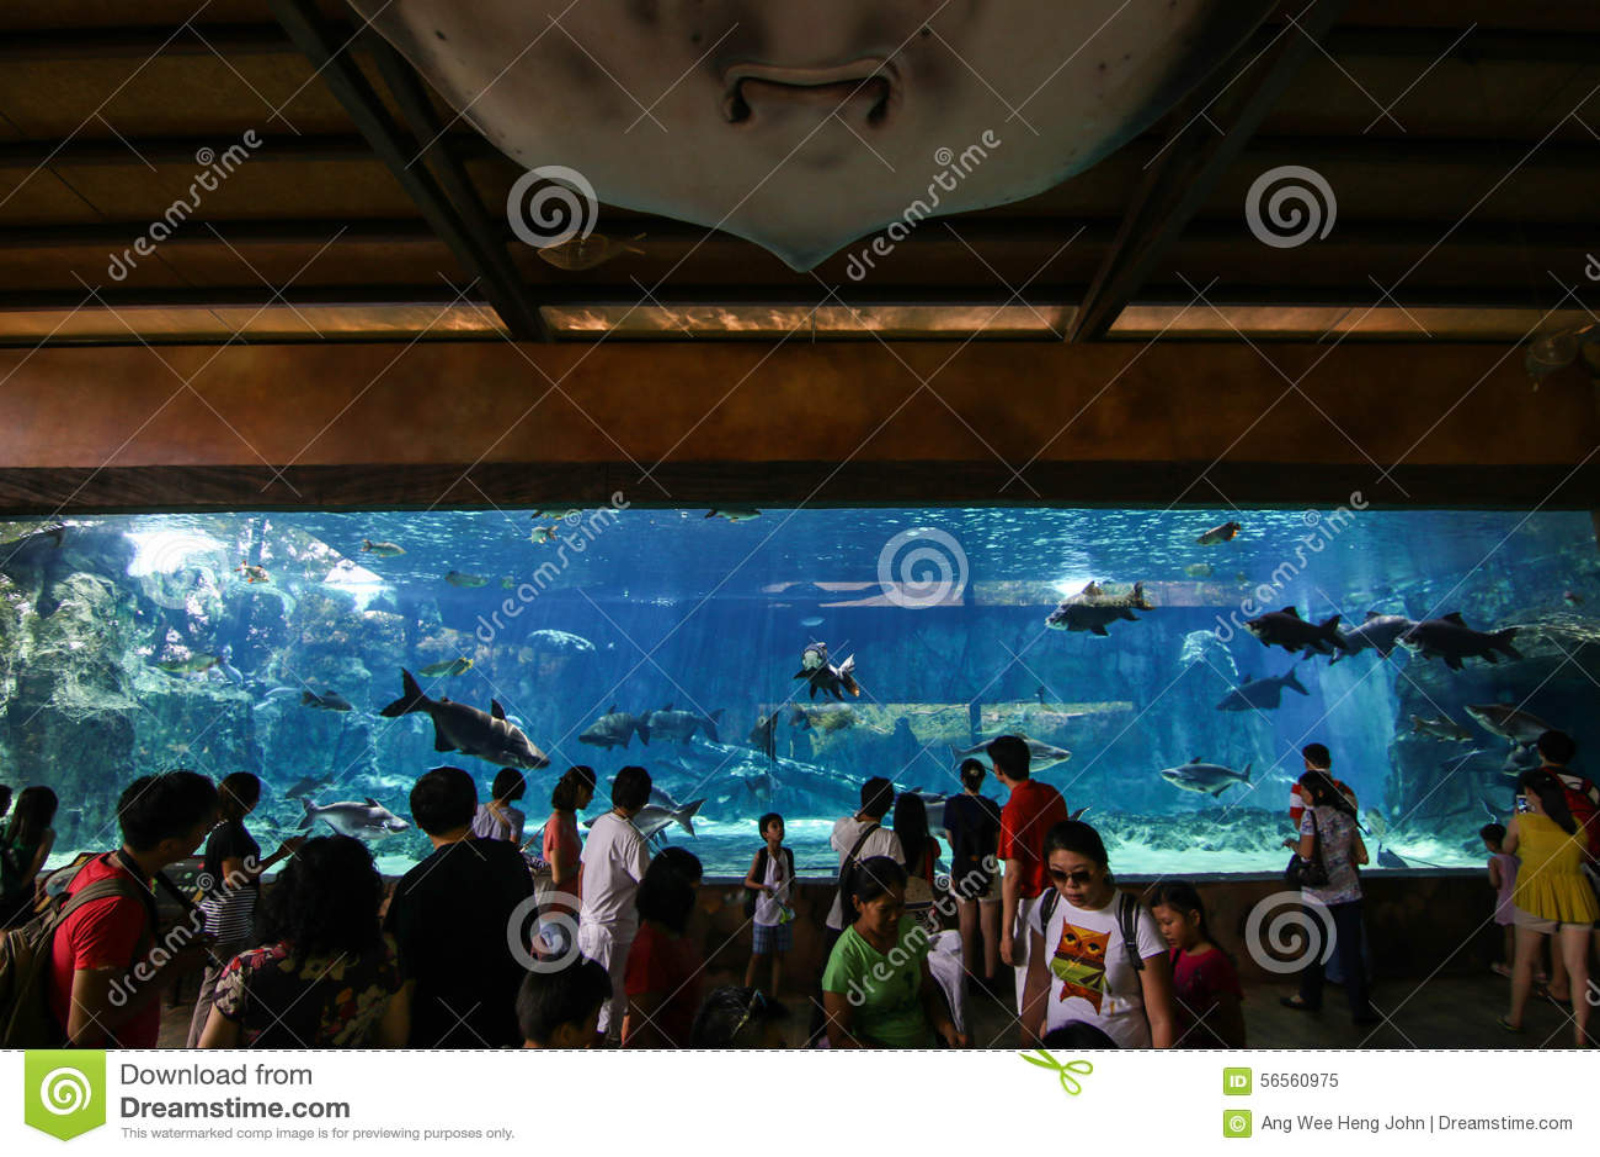 Download Υδρόβιο τουριστικό αξιοθέατο Εκδοτική εικόνα - εικόνα από γοητευτικός, εξερευνήστε: 56560975